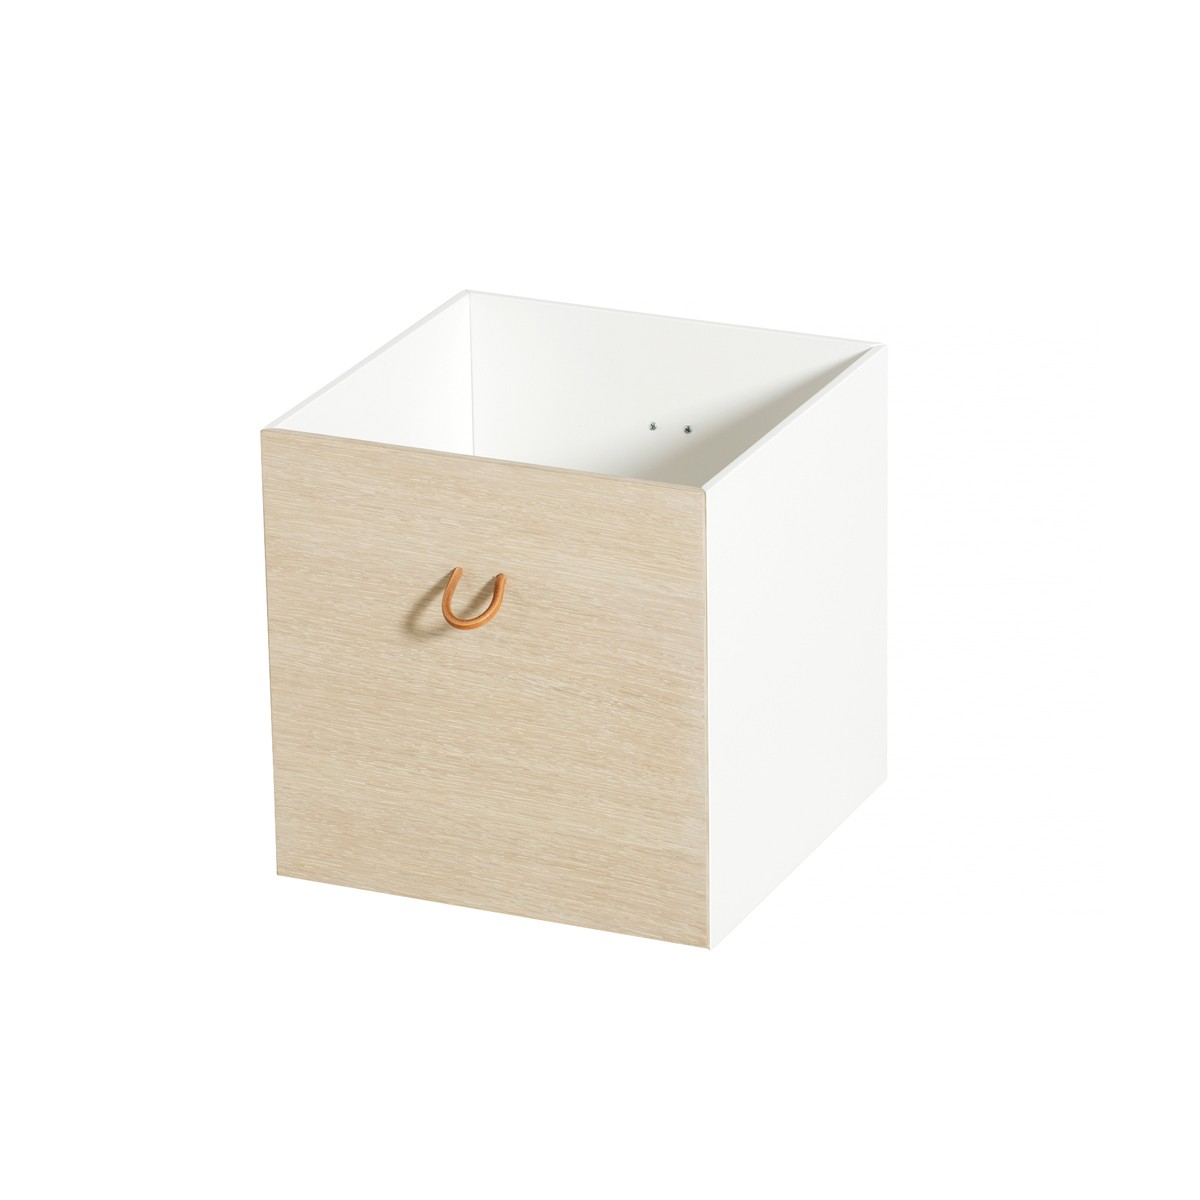 Wood 3 st förvaringslådor ek/vit, Oliver Furniture